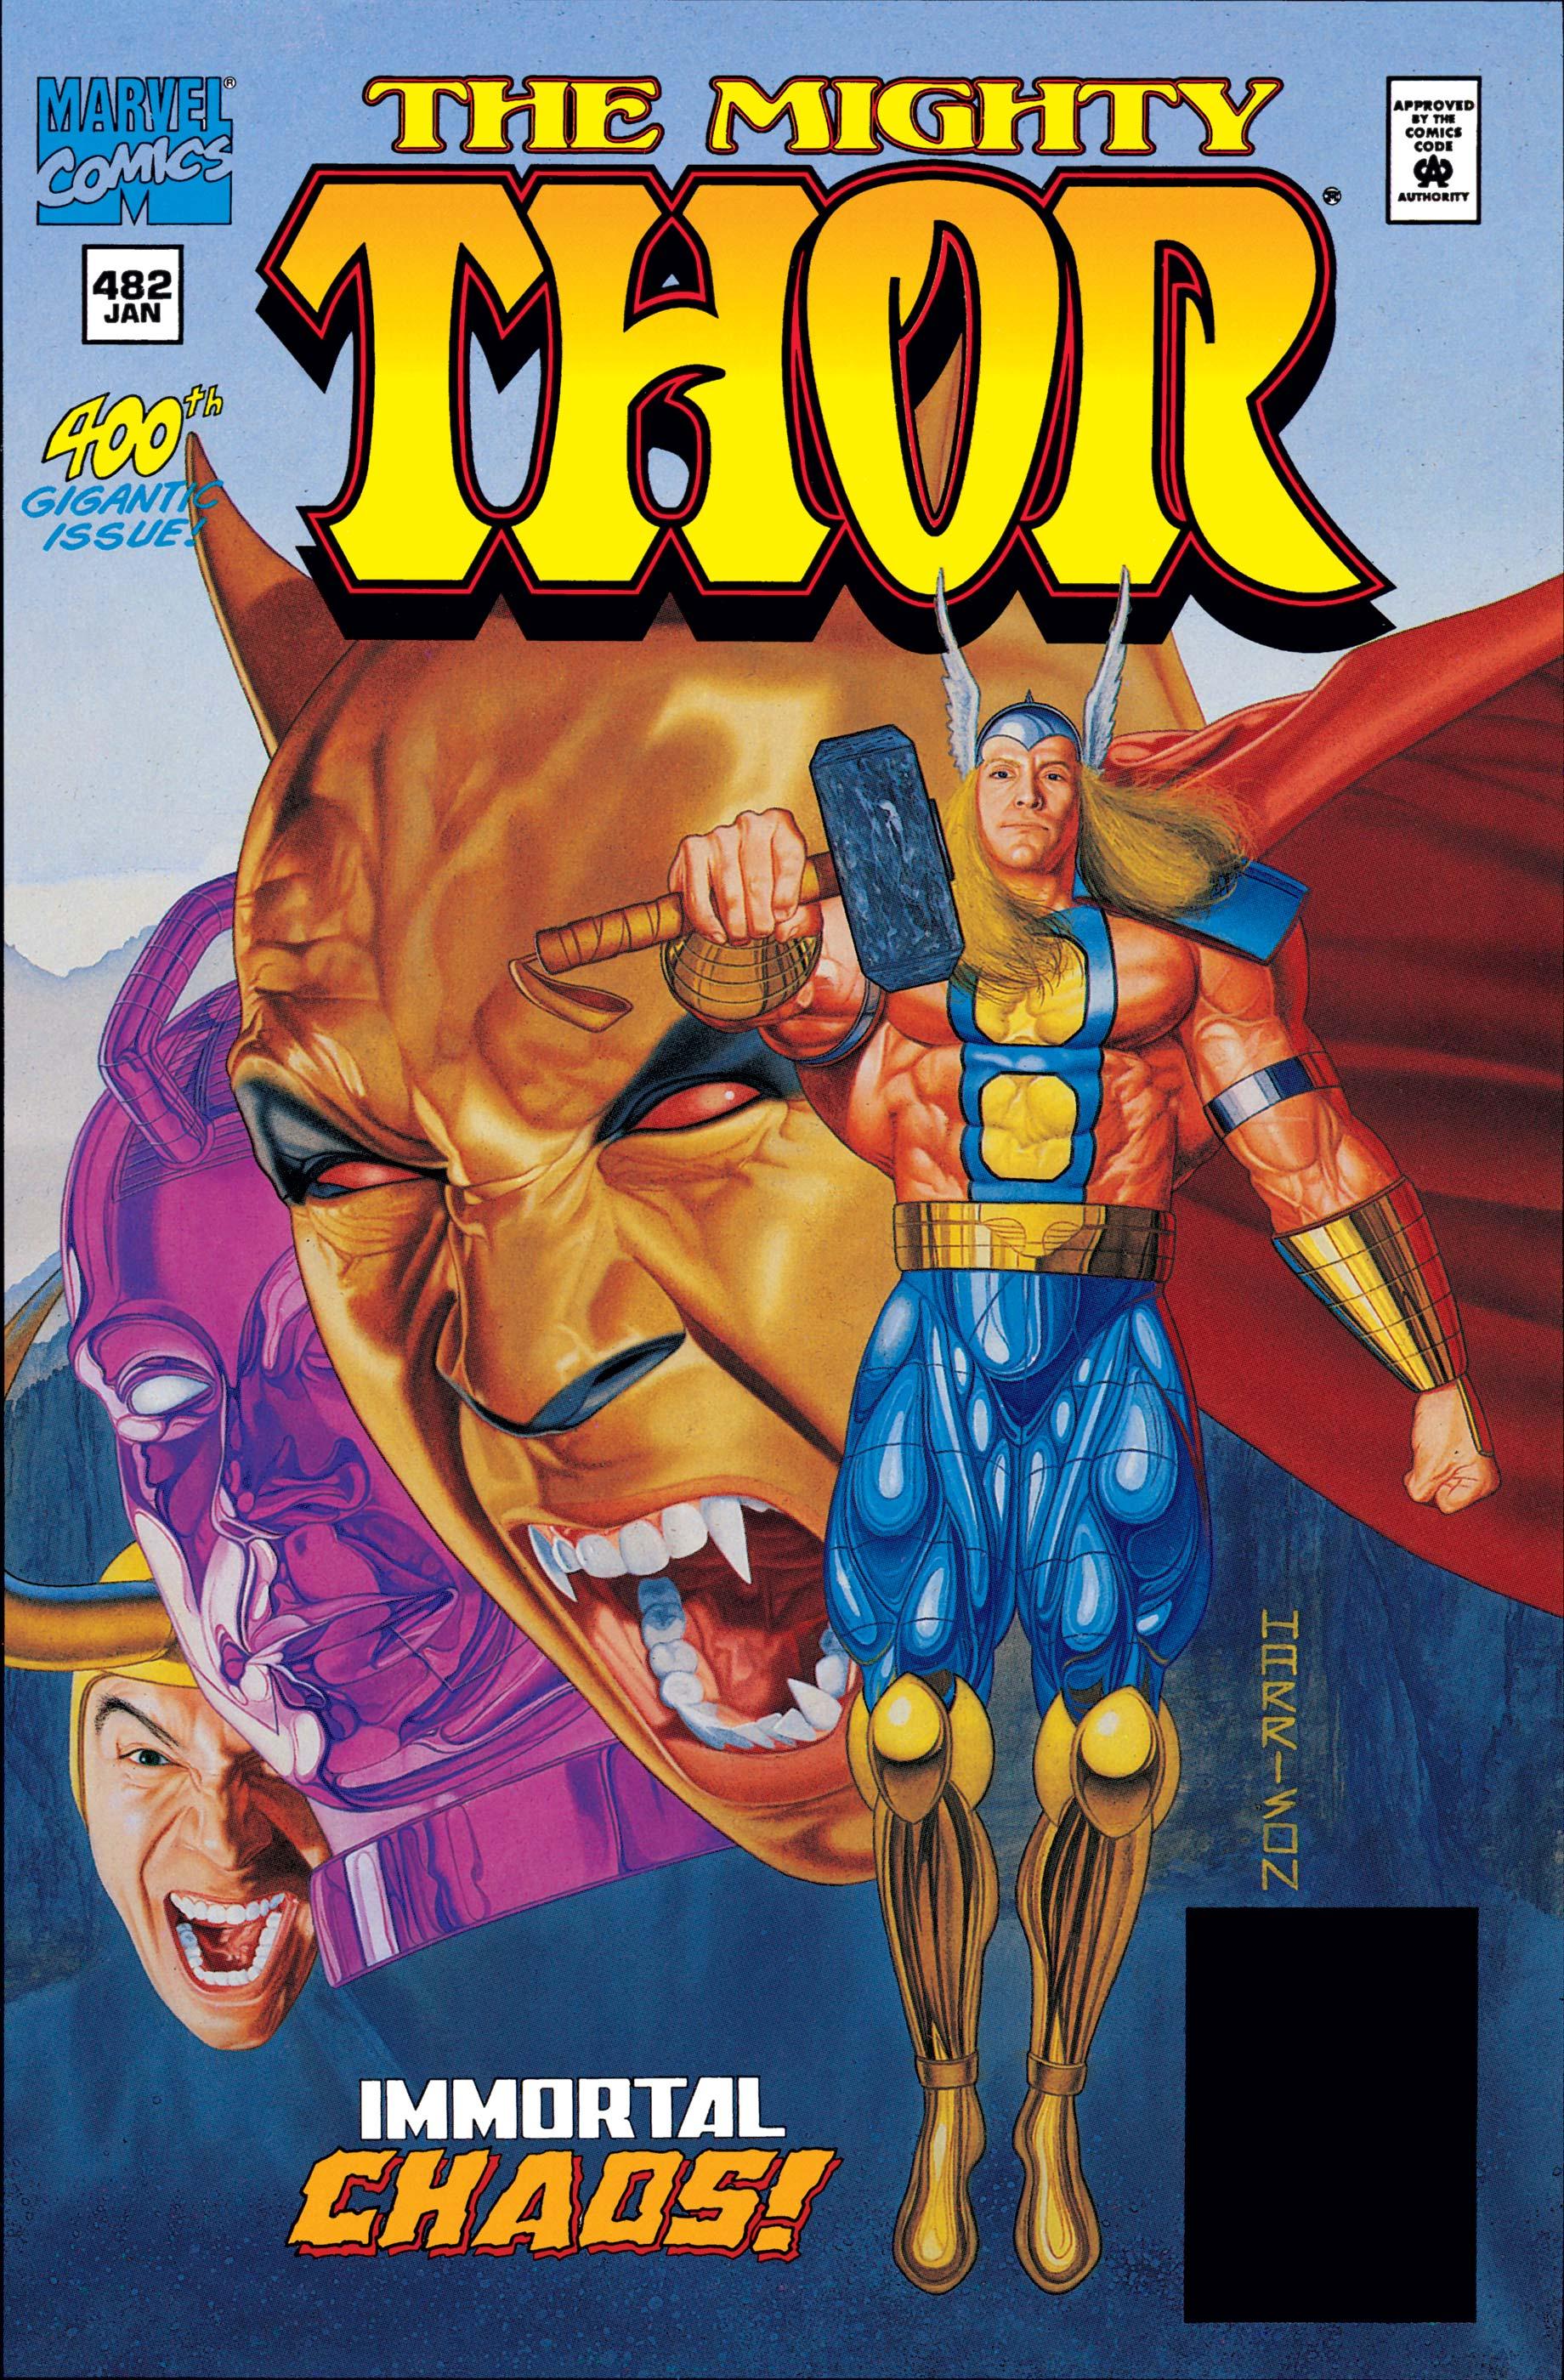 Thor (1966) #482